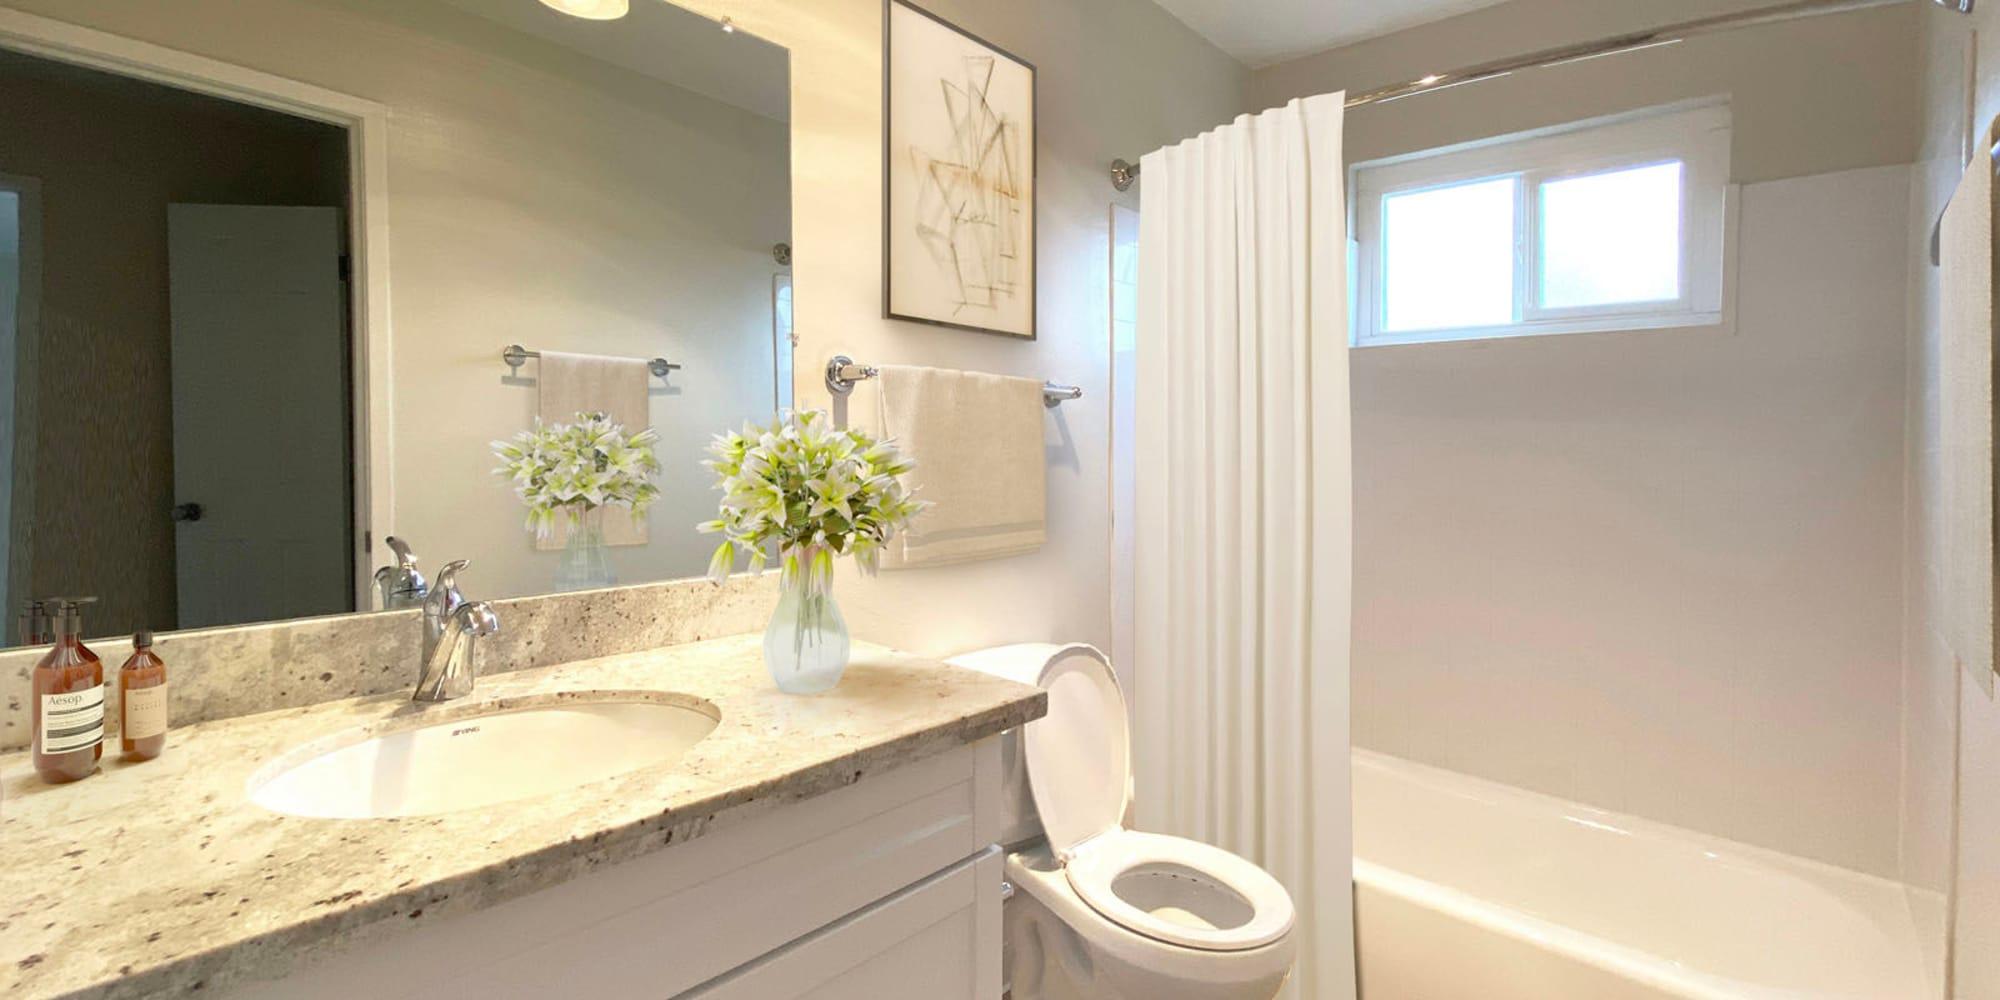 Granite countertop and a large vanity mirror in a model apartment's bathroom at Pleasanton Heights in Pleasanton, California